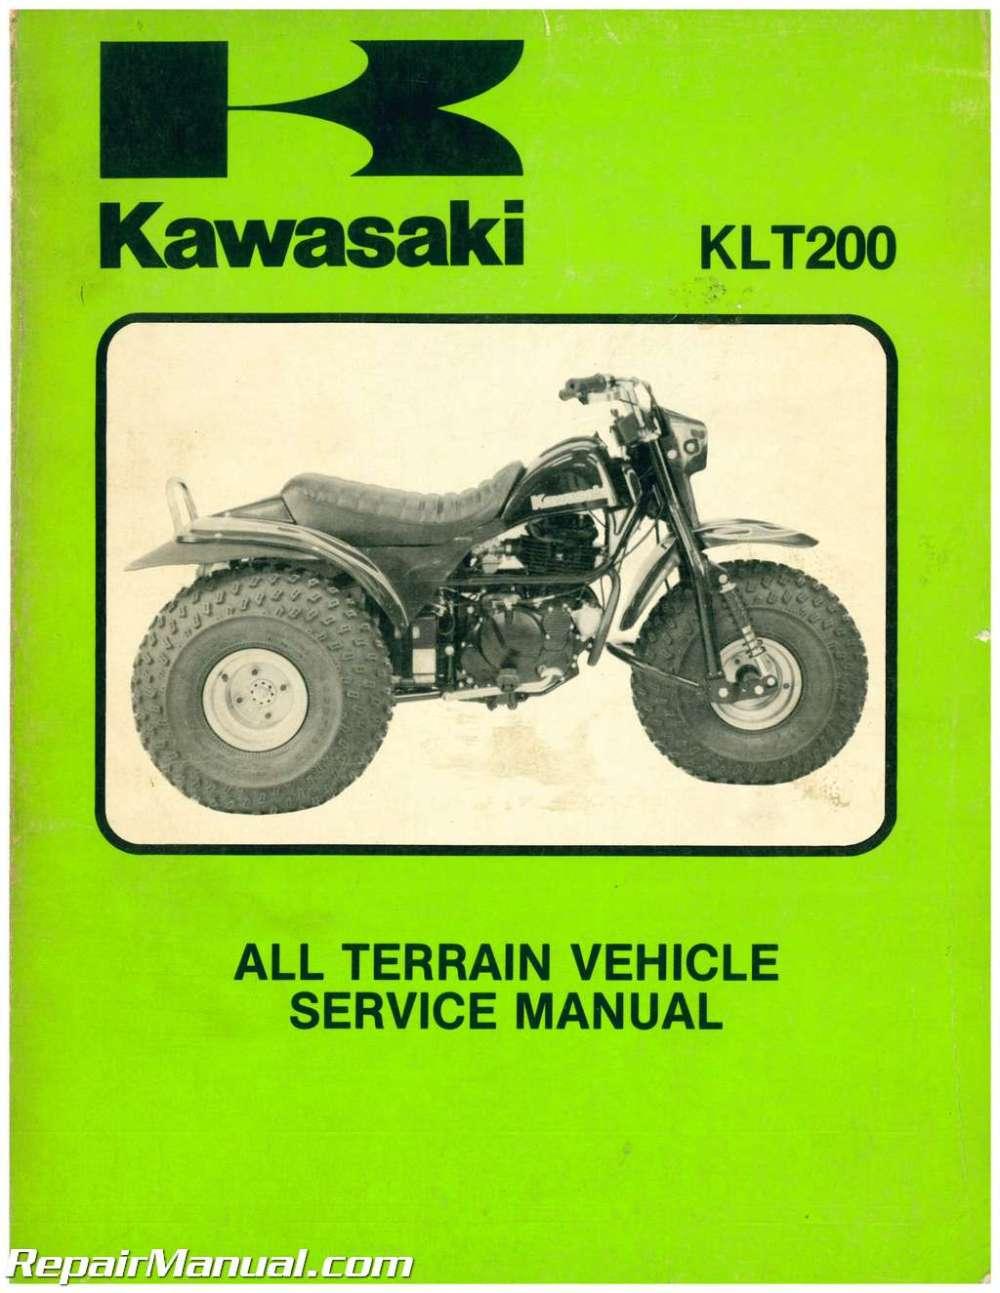 medium resolution of 1983 kawasaki klt200 atc three wheeler service manual kawasaki klt 200 wiring diagram